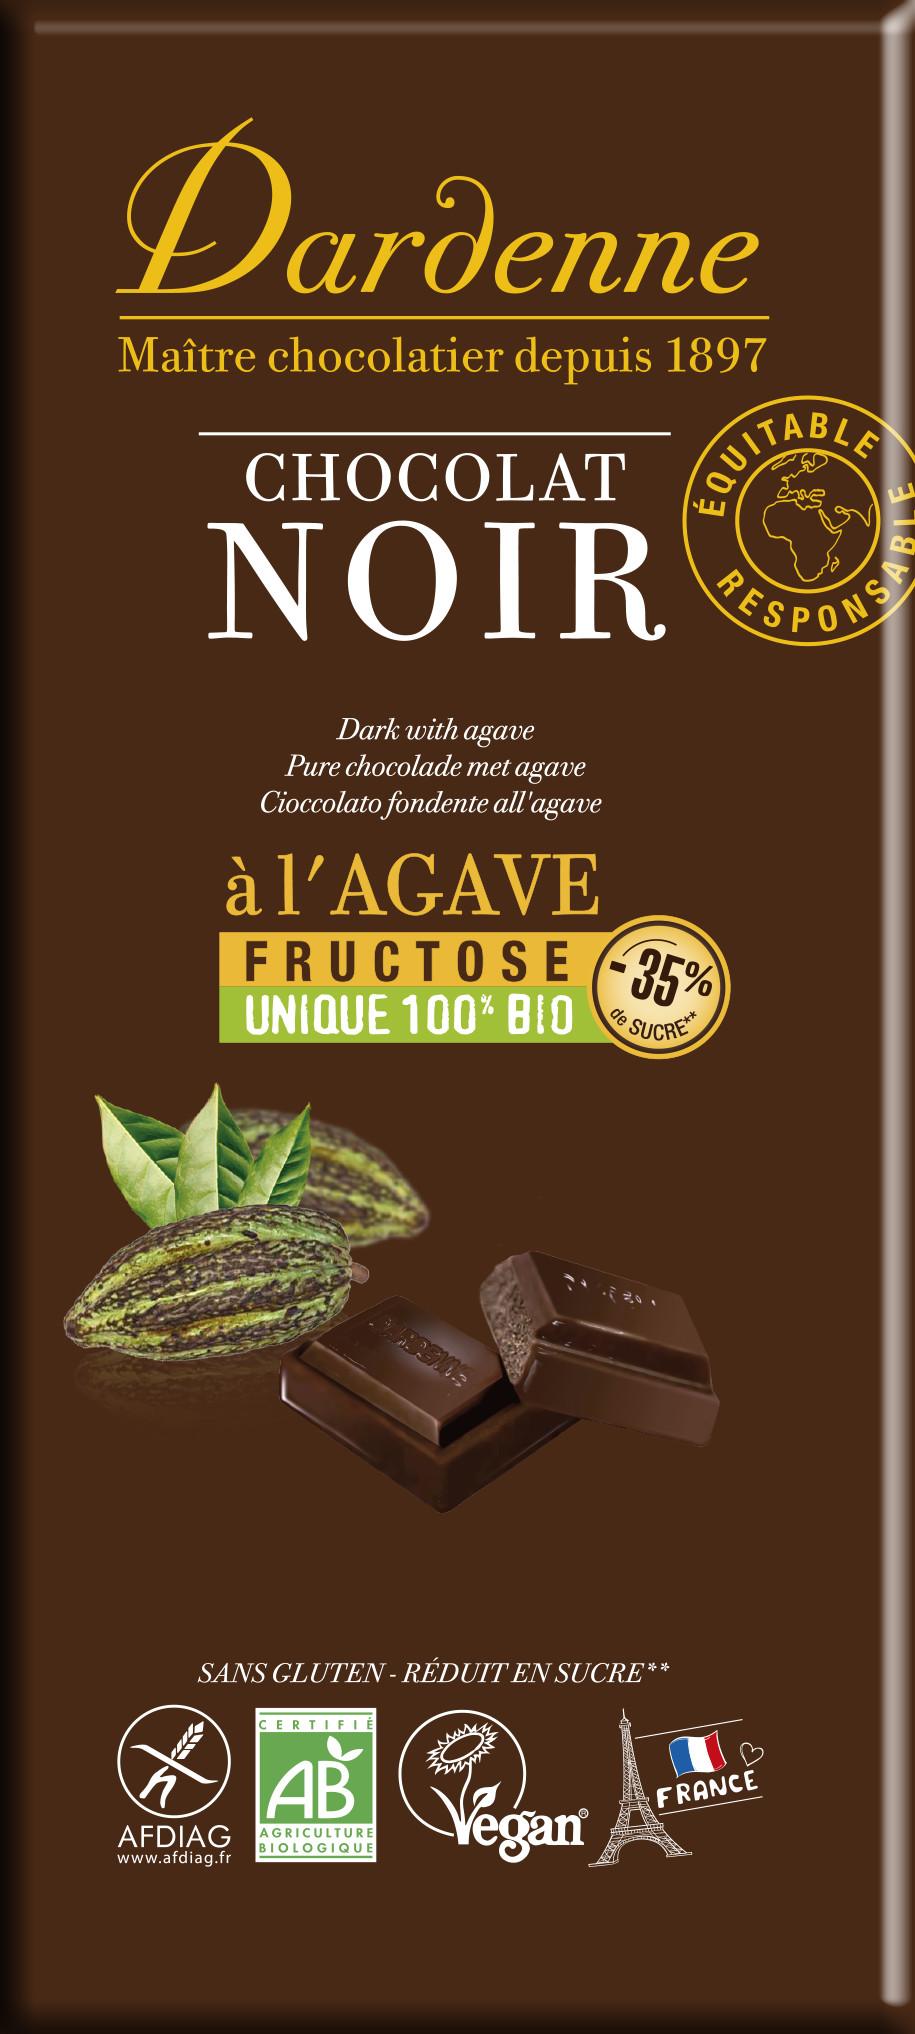 Image DARDENNE chocolat noir au fructose